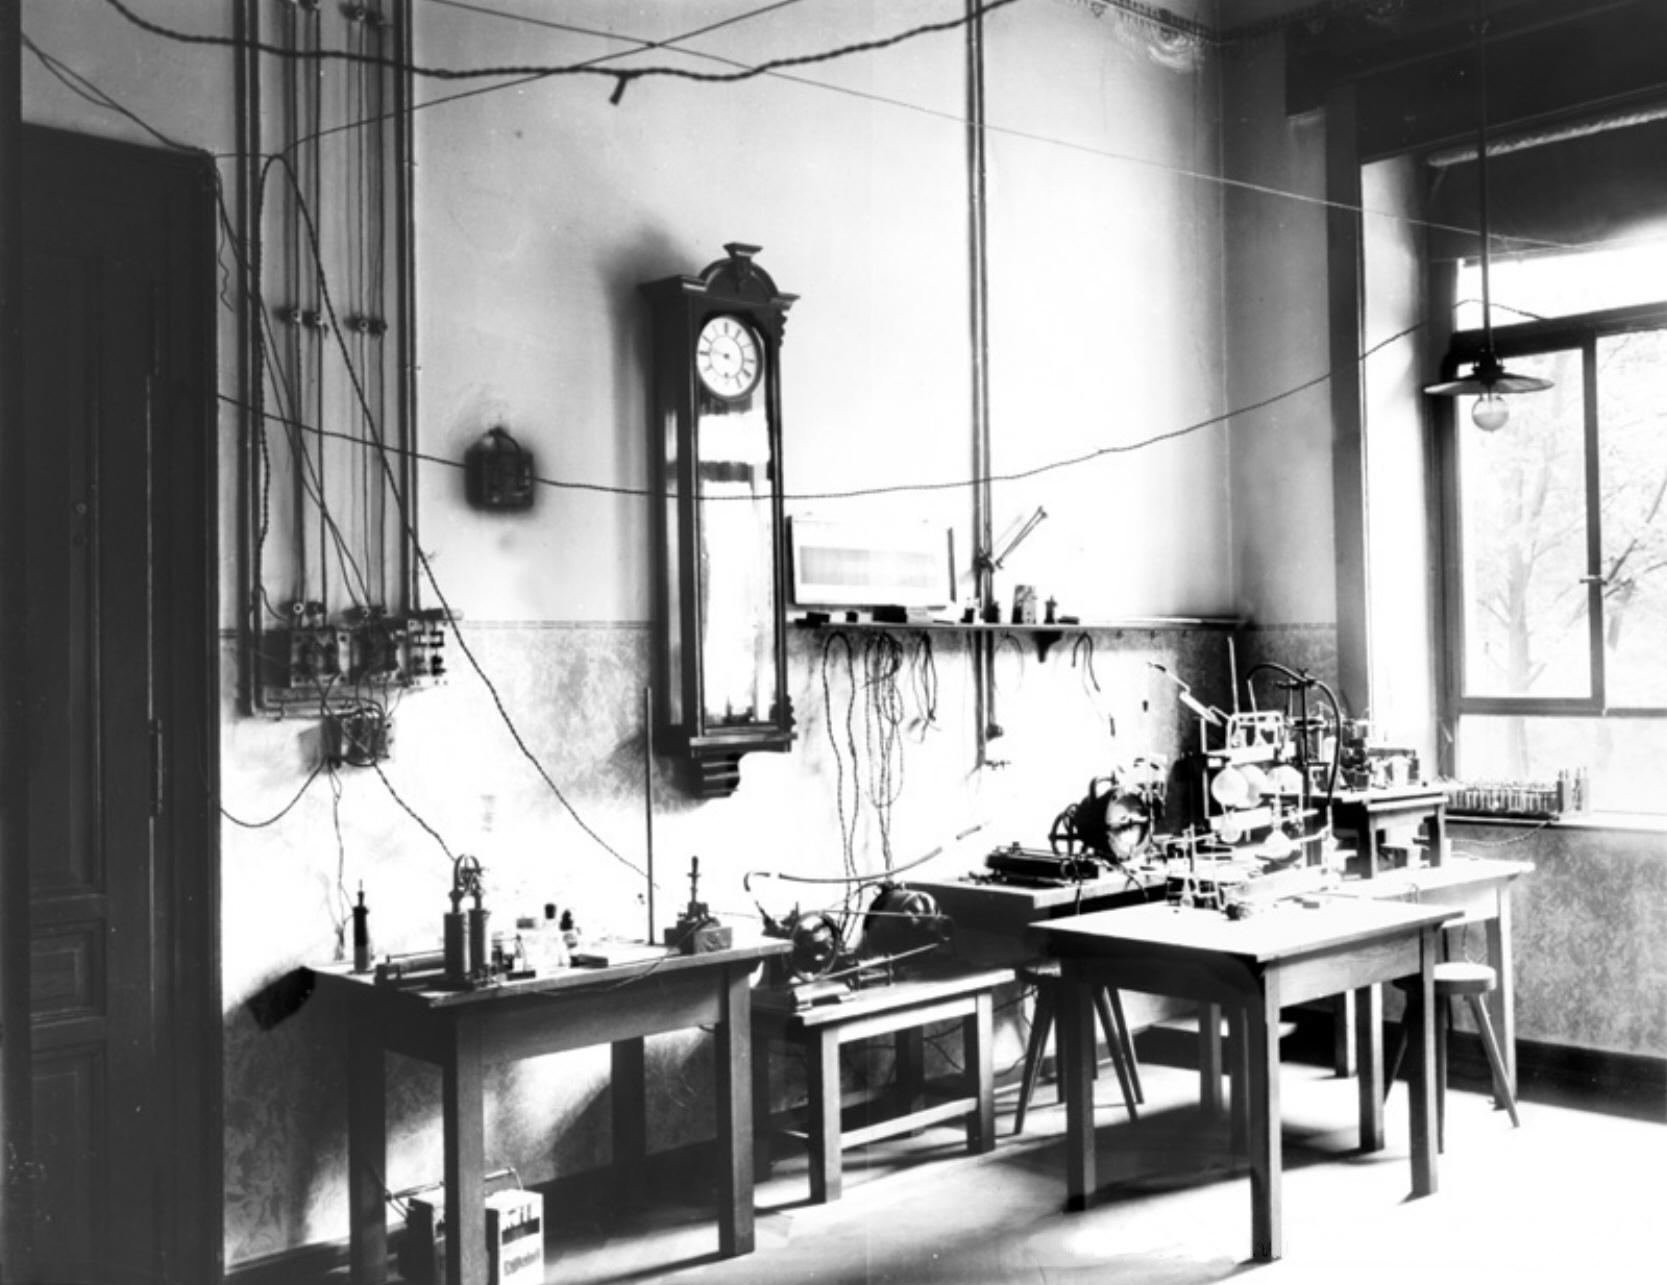 Röentgen's laboratory at the University of Würzburg, Germany. Wikimedia Commons, public domain.